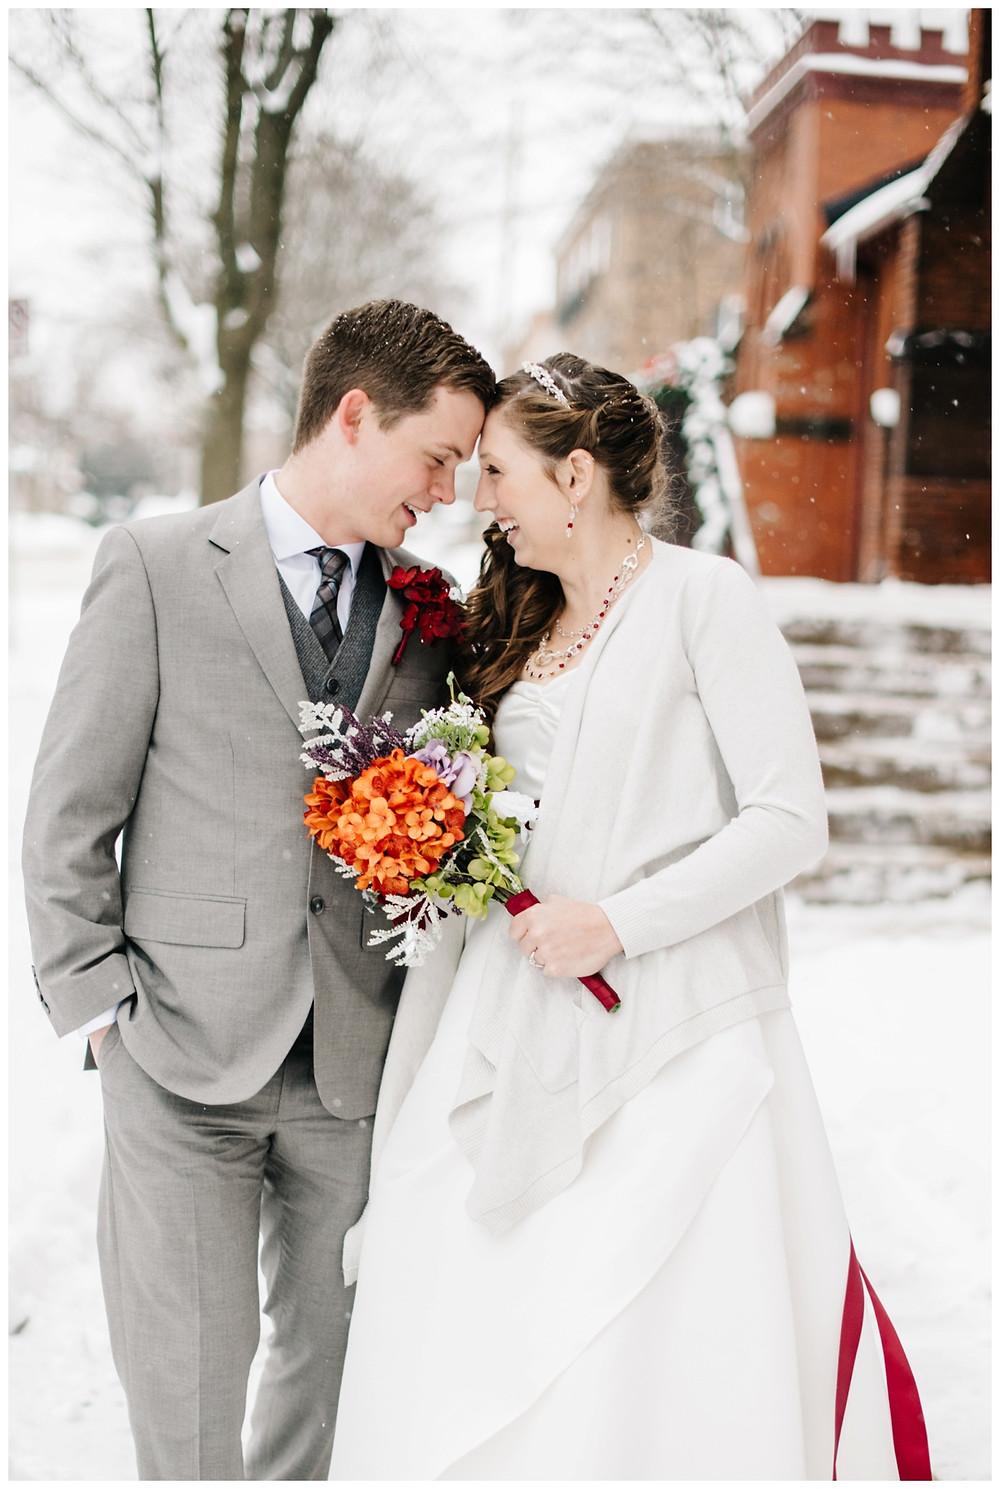 bride-and-groom-laughing-in-snow-at-milwaukee-wedding-by-milwaukee-wedding-photographer-kyra-rane-photographer